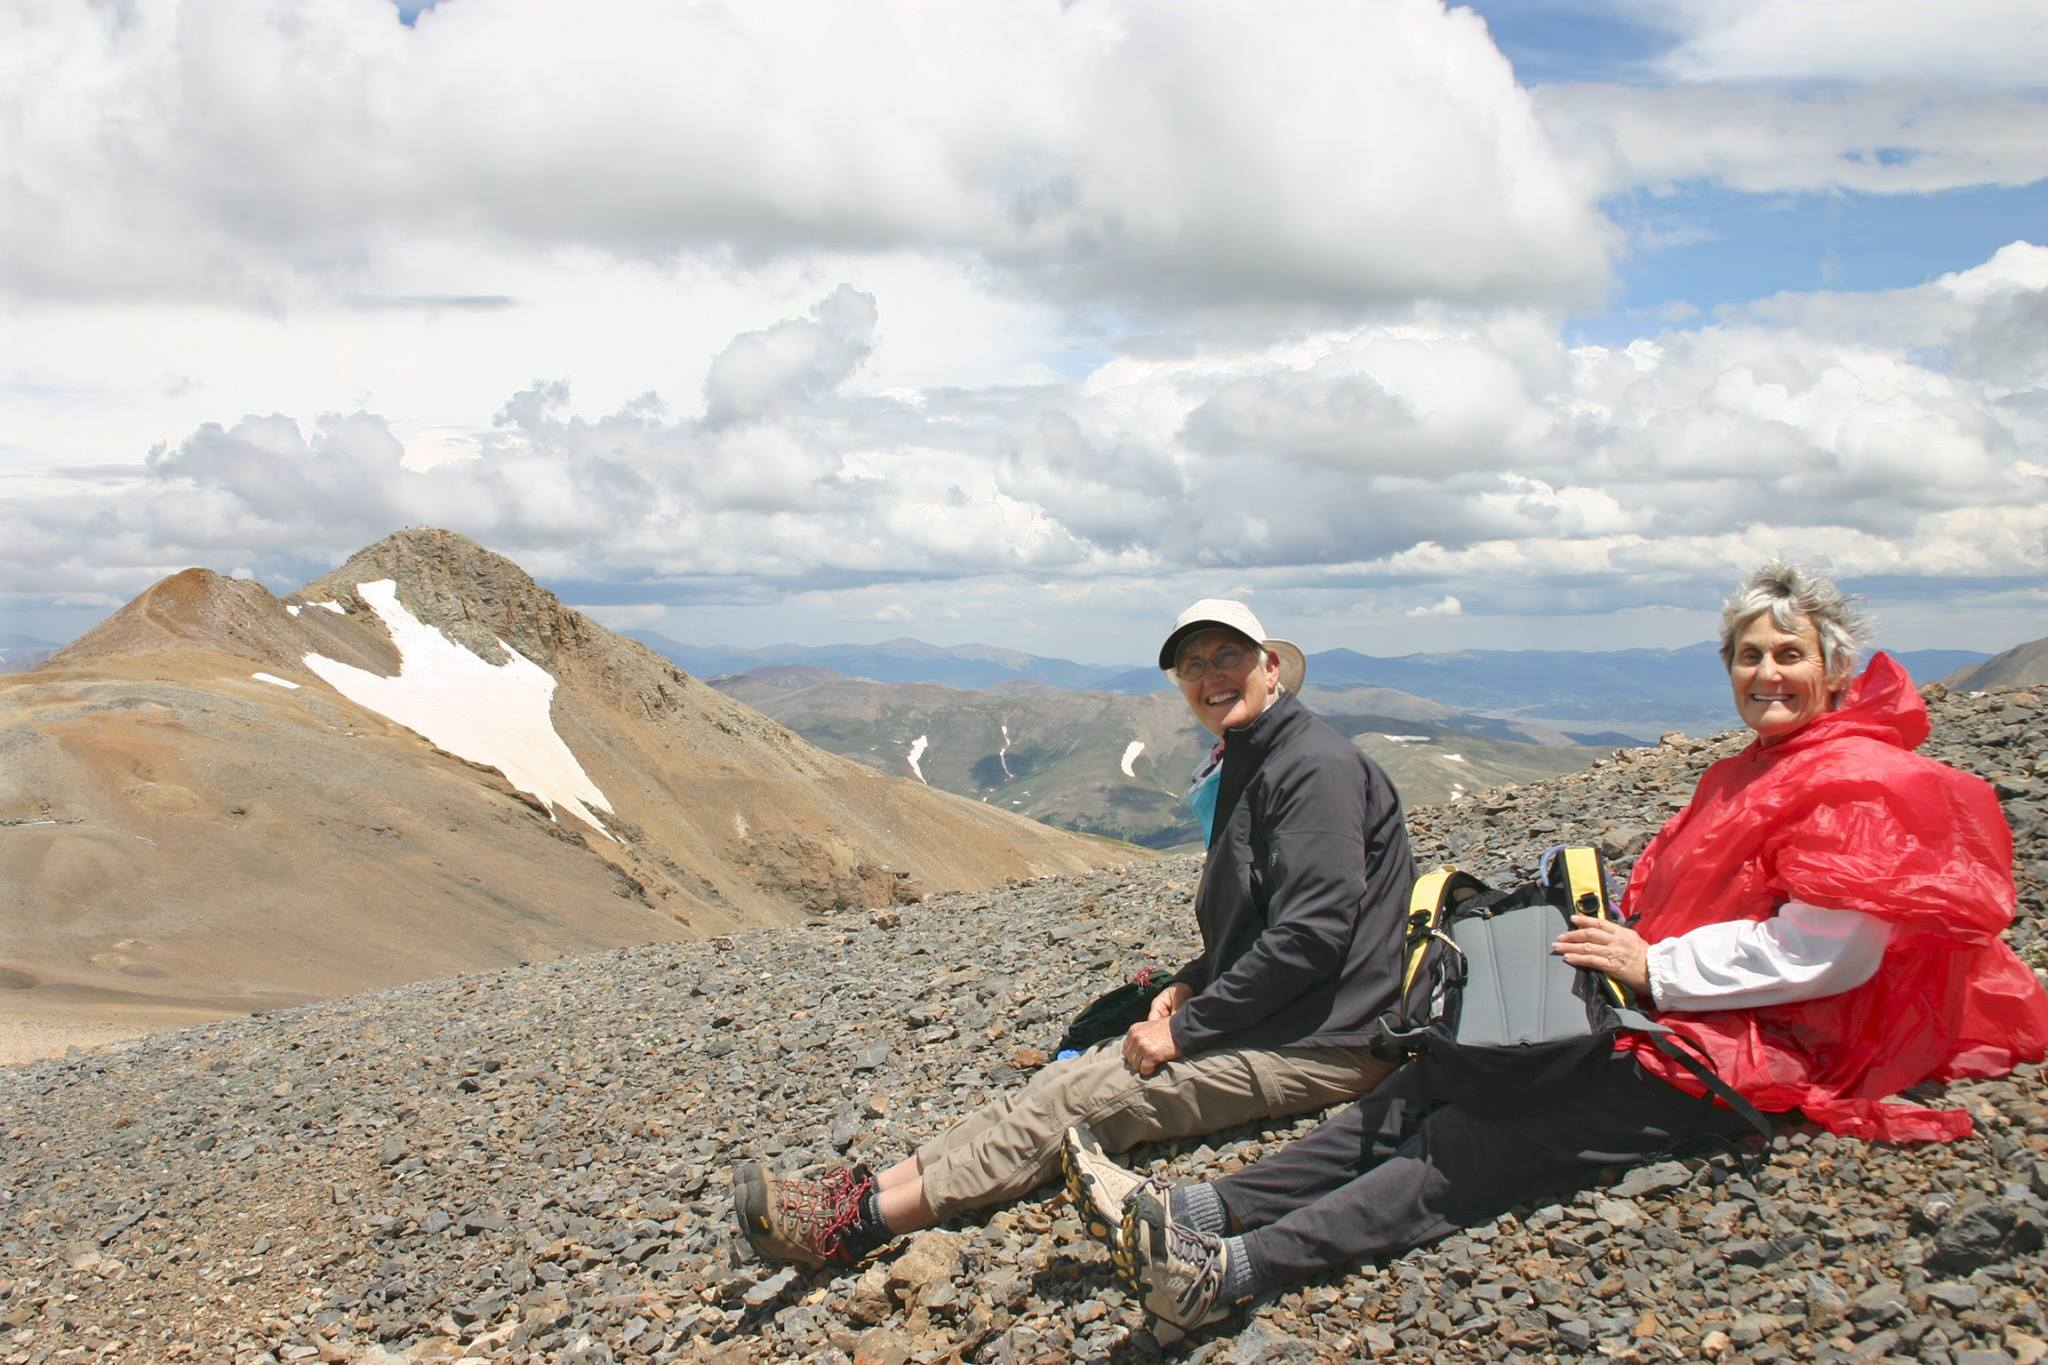 Kilimanjaro Climbing Deaths O